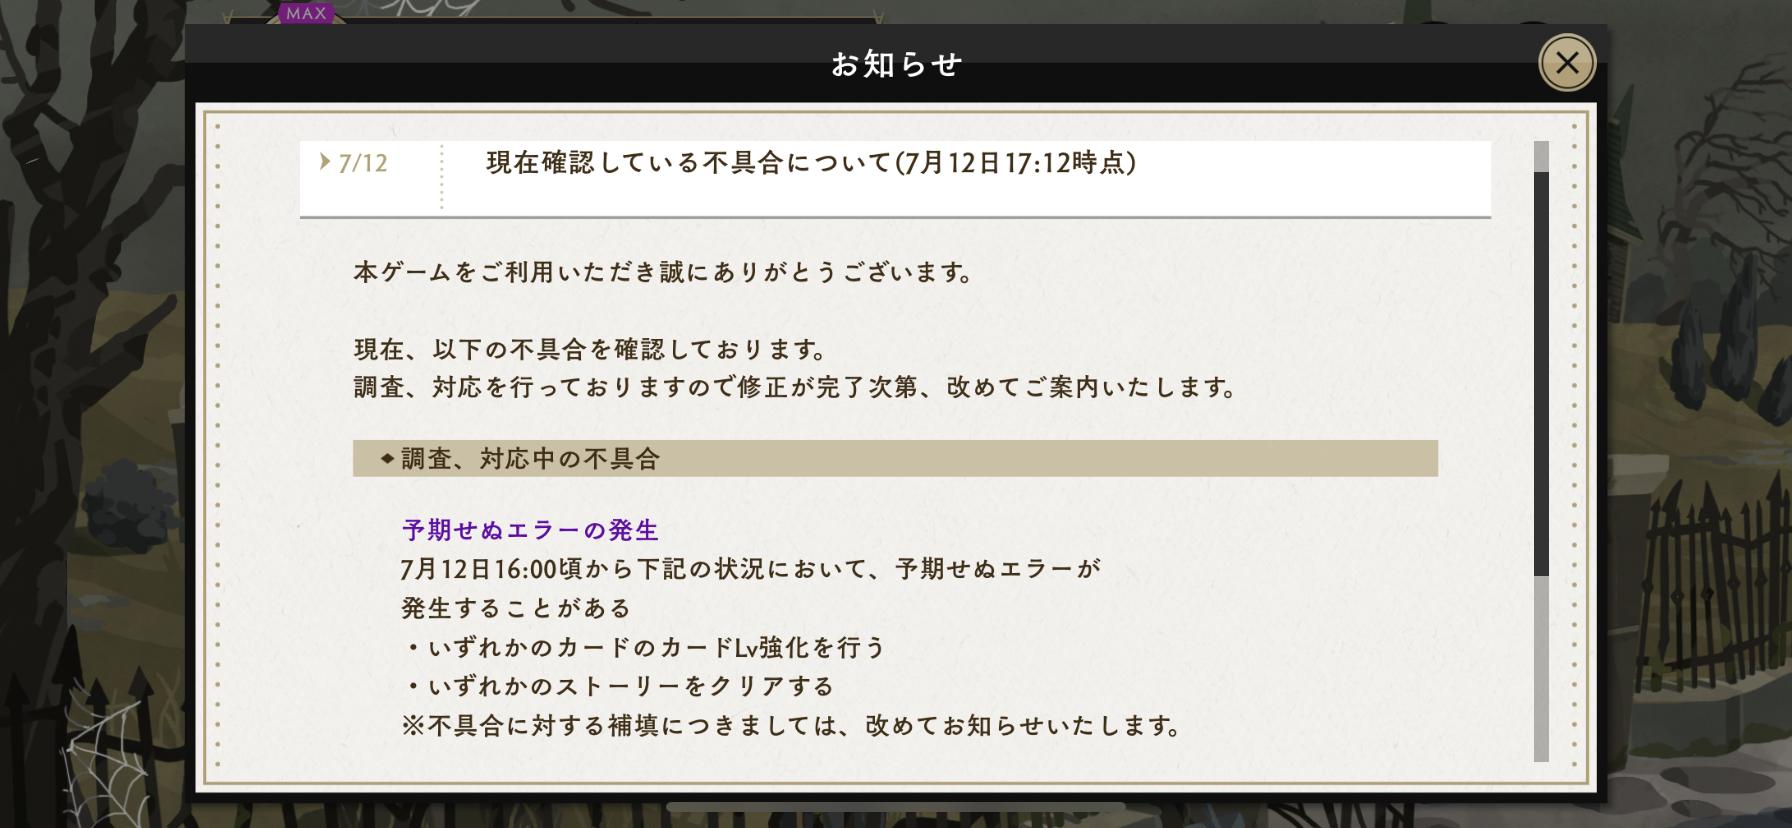 f:id:motimoti444:20210712172228p:plain